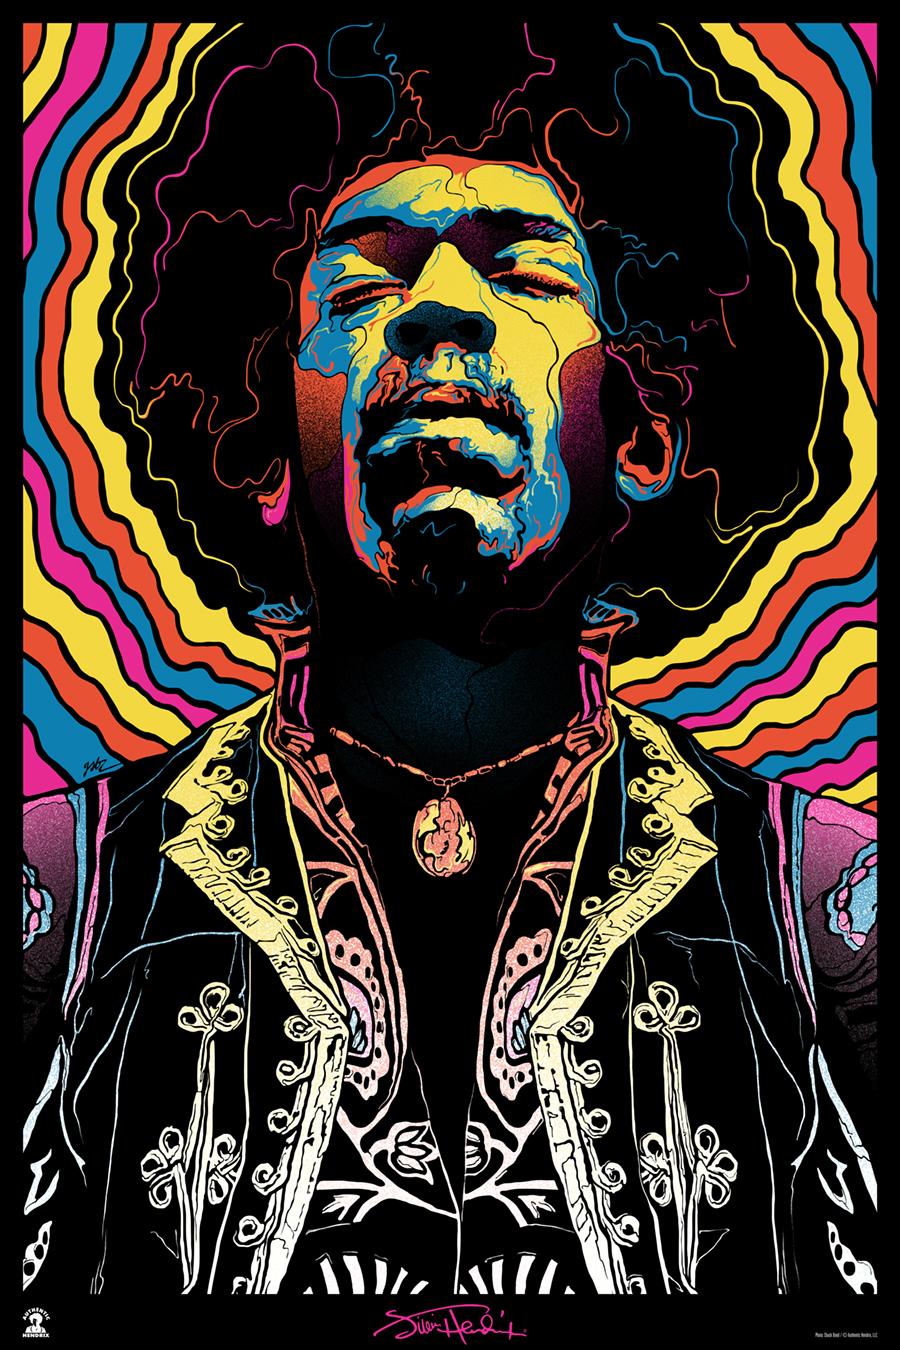 Gabz Jimi Hendrix Voodoo Child Poster Variant 2015